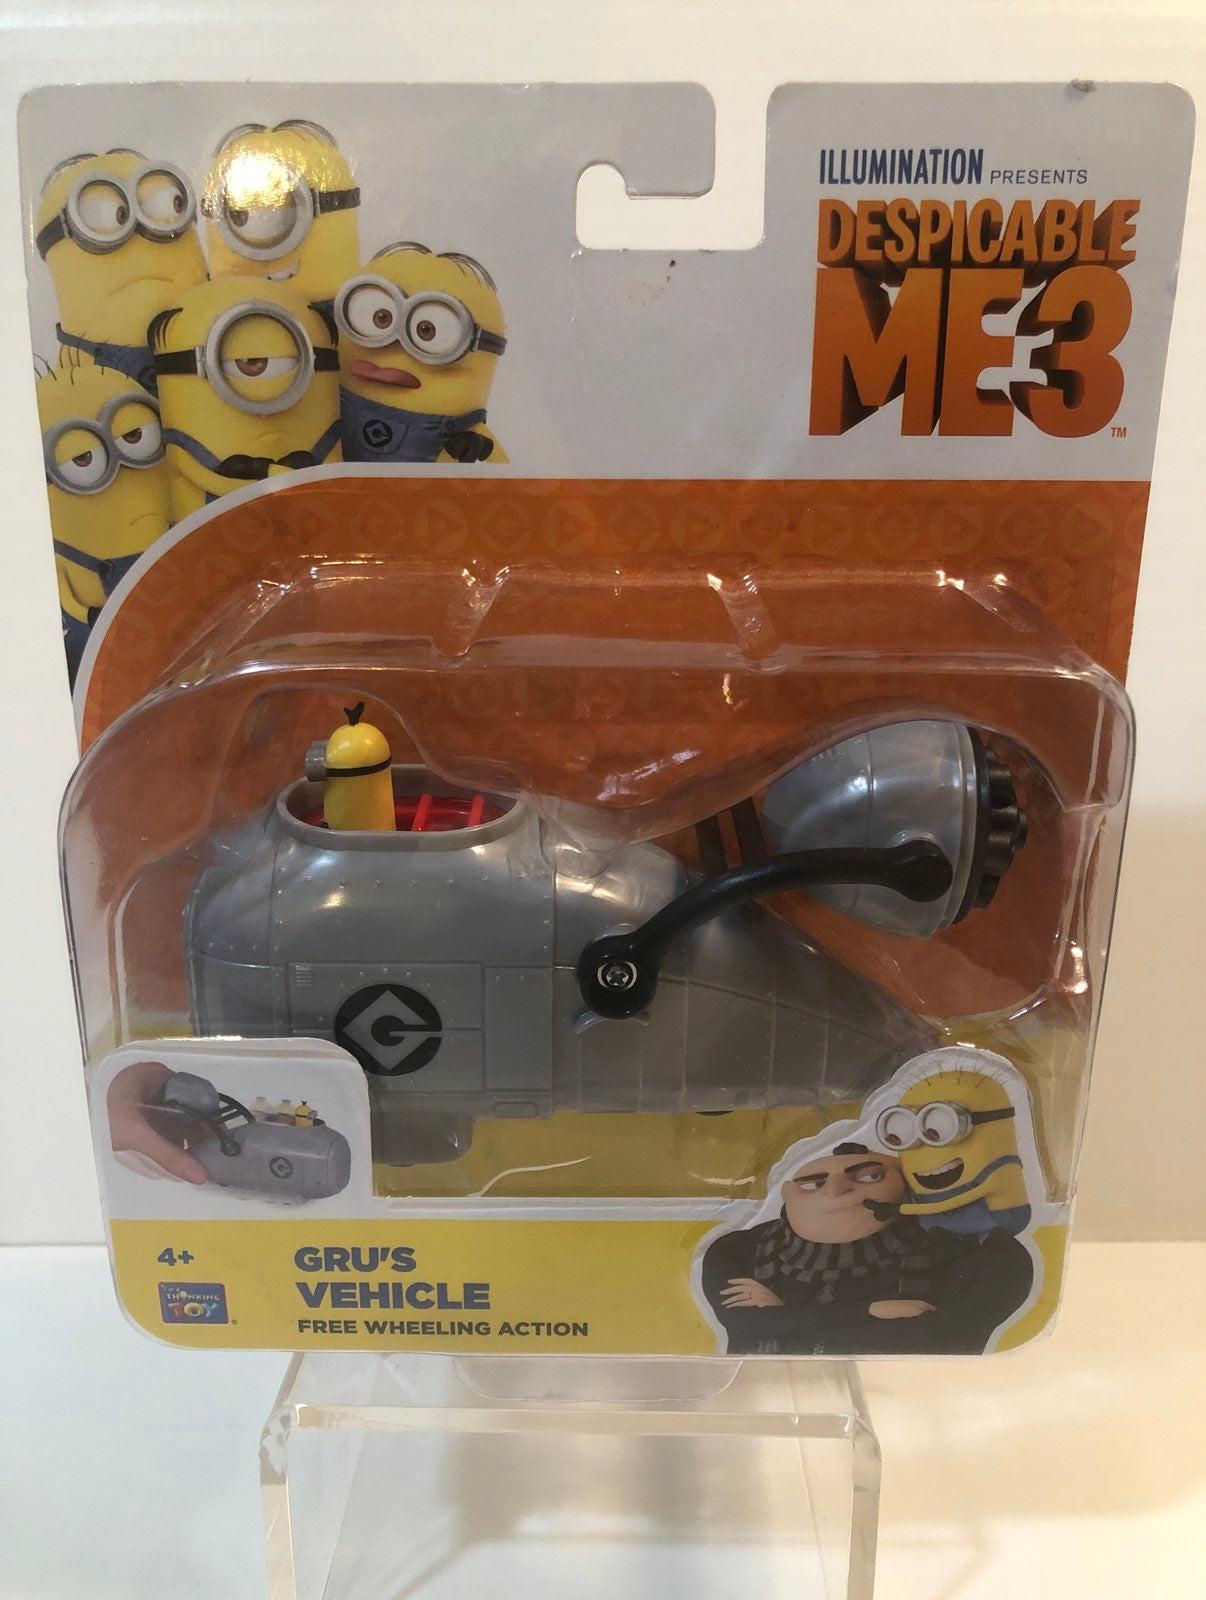 Gru's Vehicle Despicable Me 3